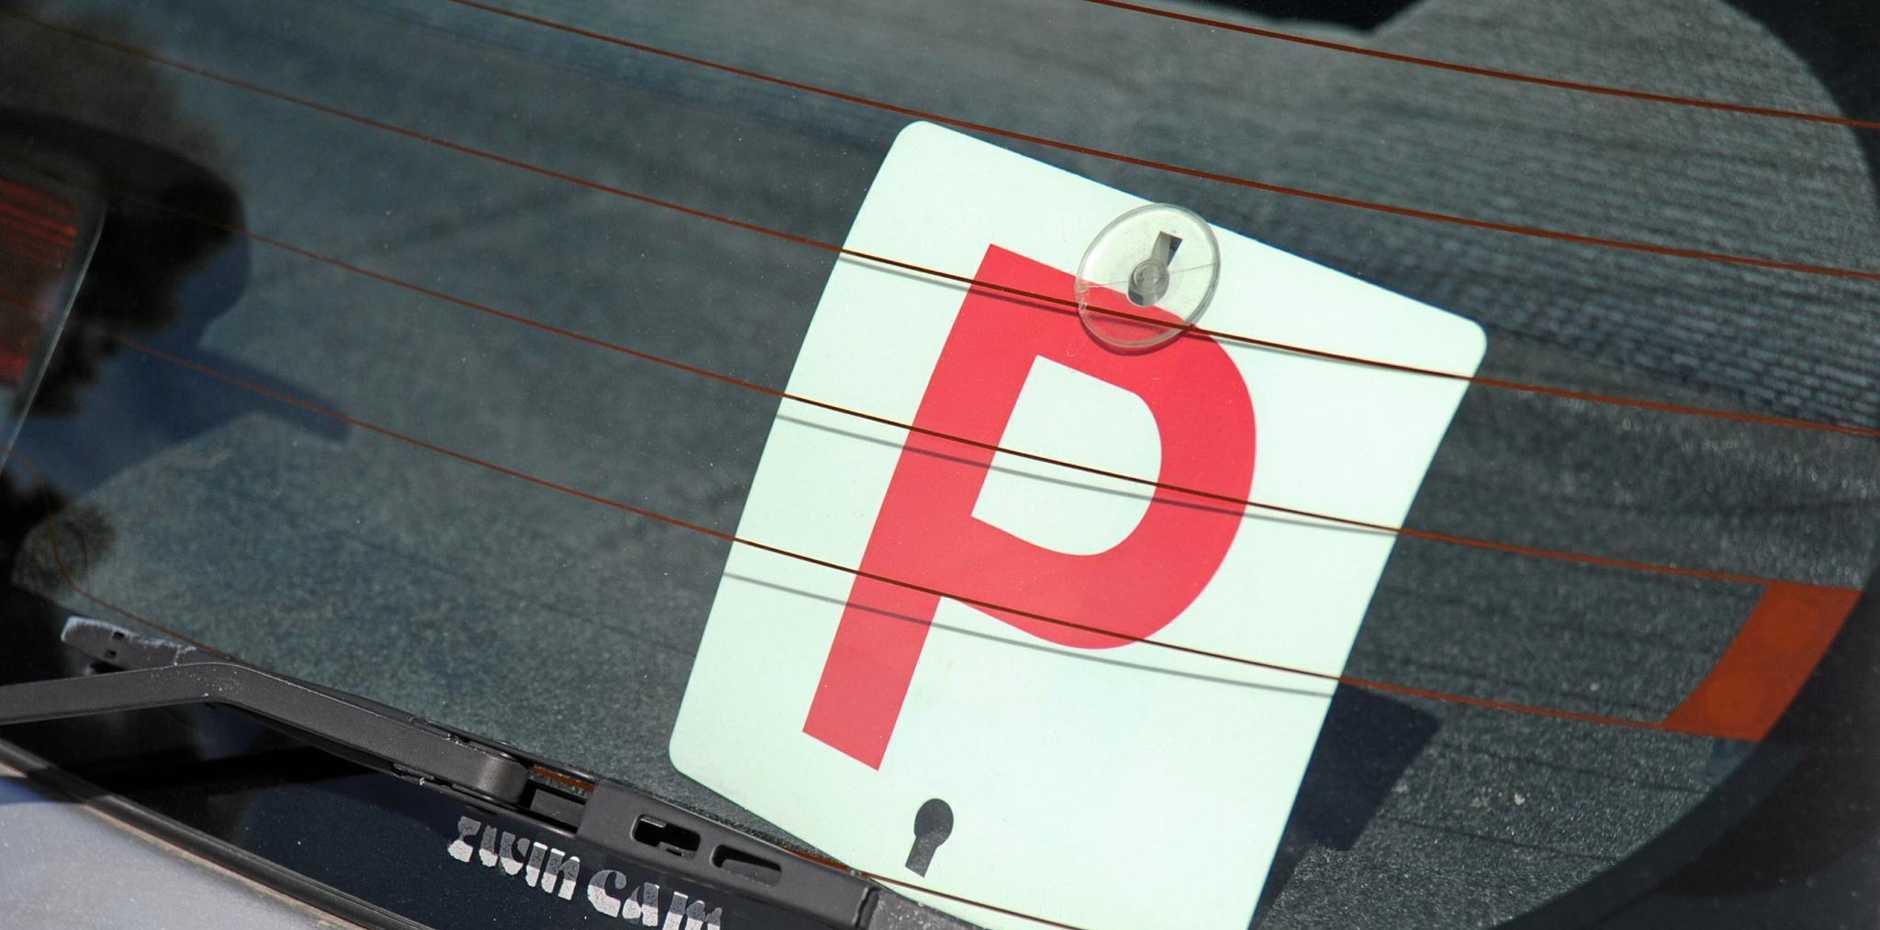 P platein rear window Photo: Alistair Brightman / Fraser Coast Chronicle